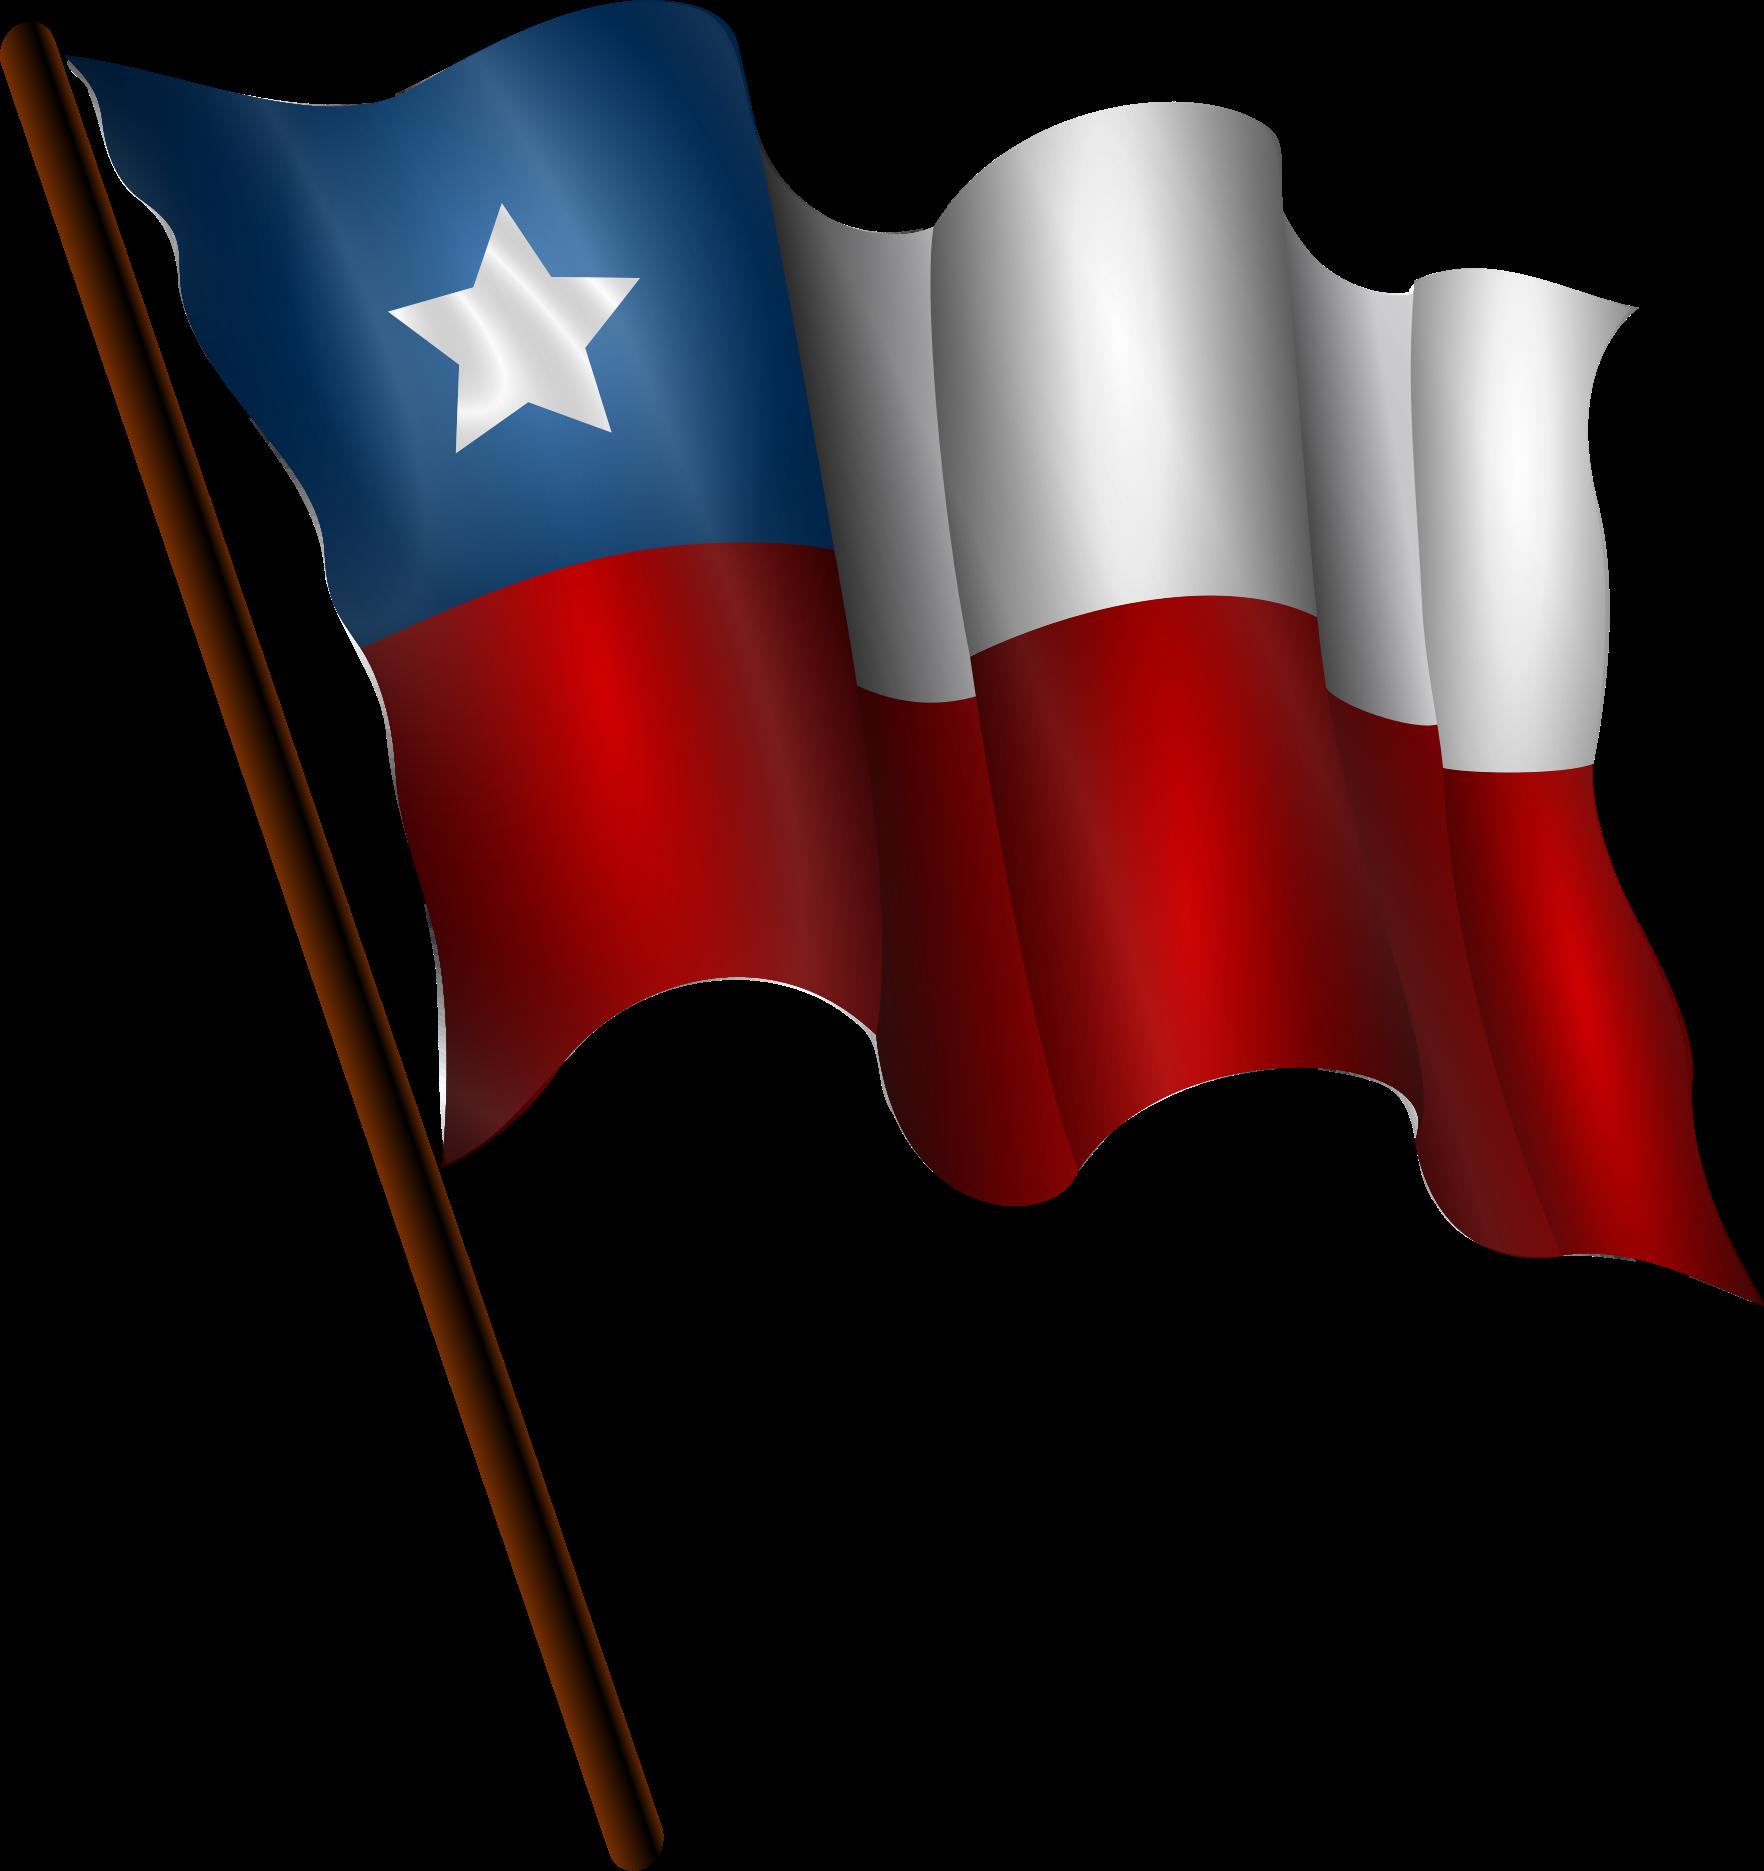 Chile Flag PNG Transparent Images.